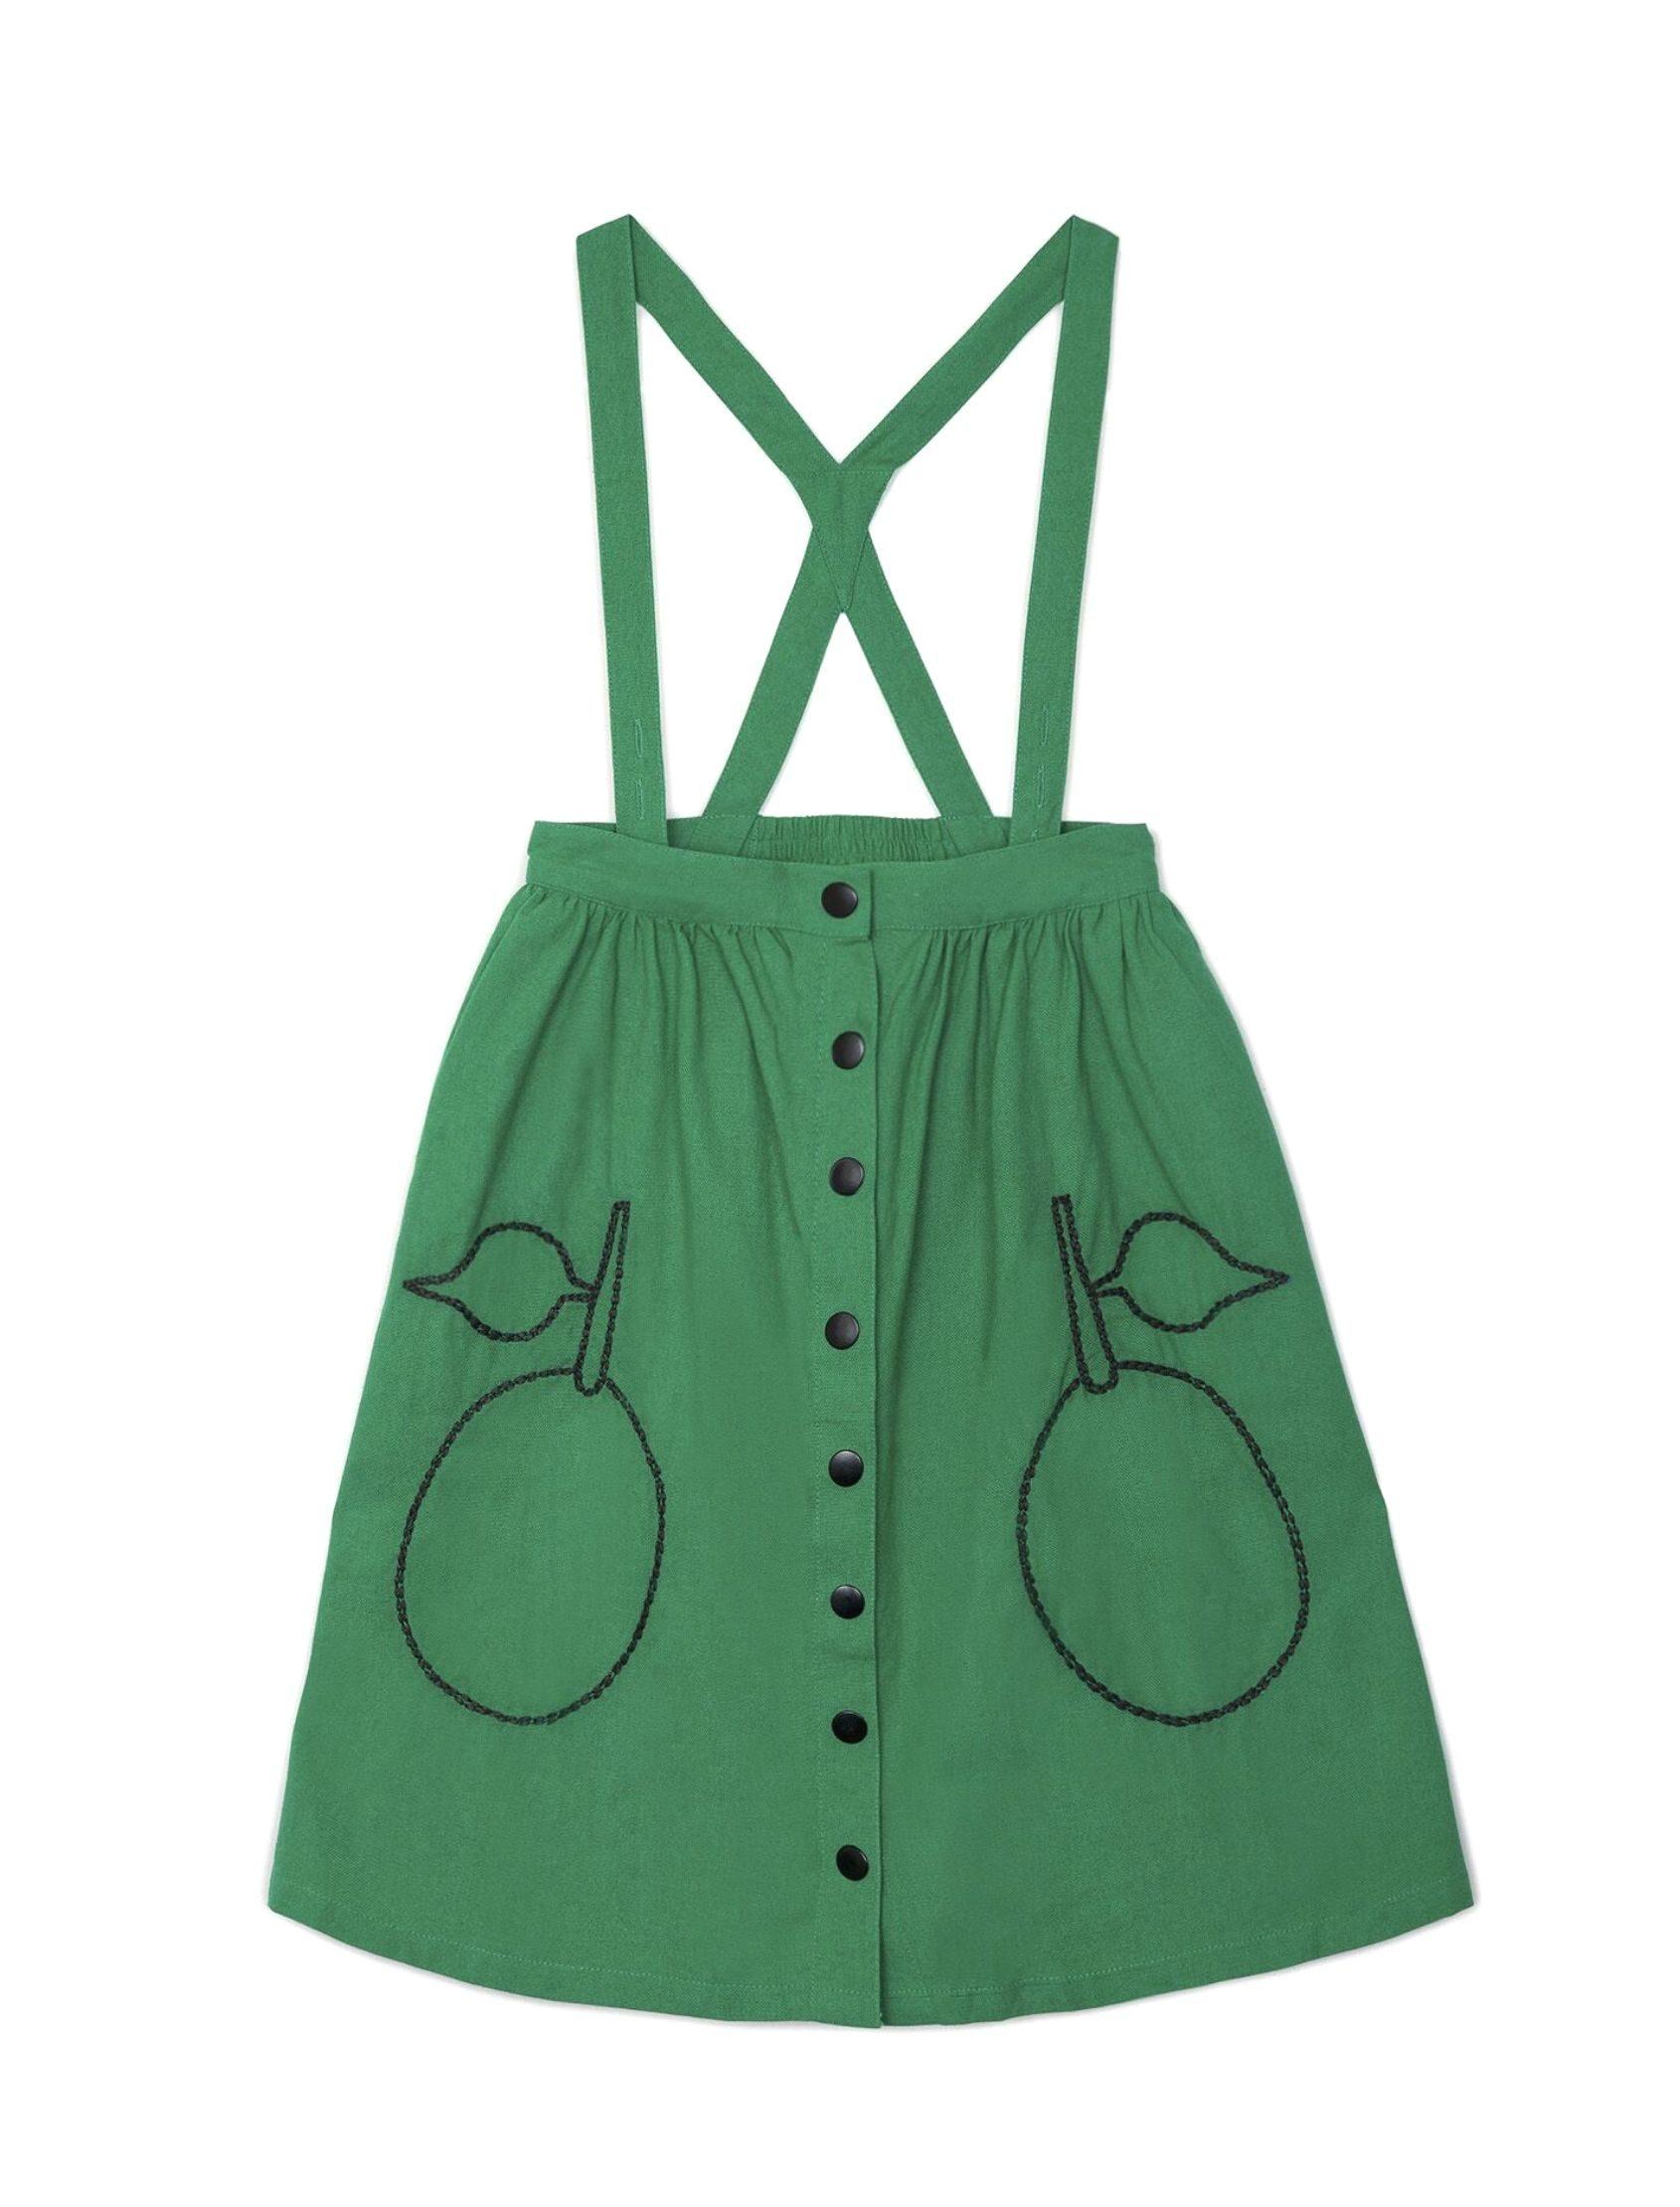 vestido pichi verde con mangos bordados de la marca nadadelazos para niña